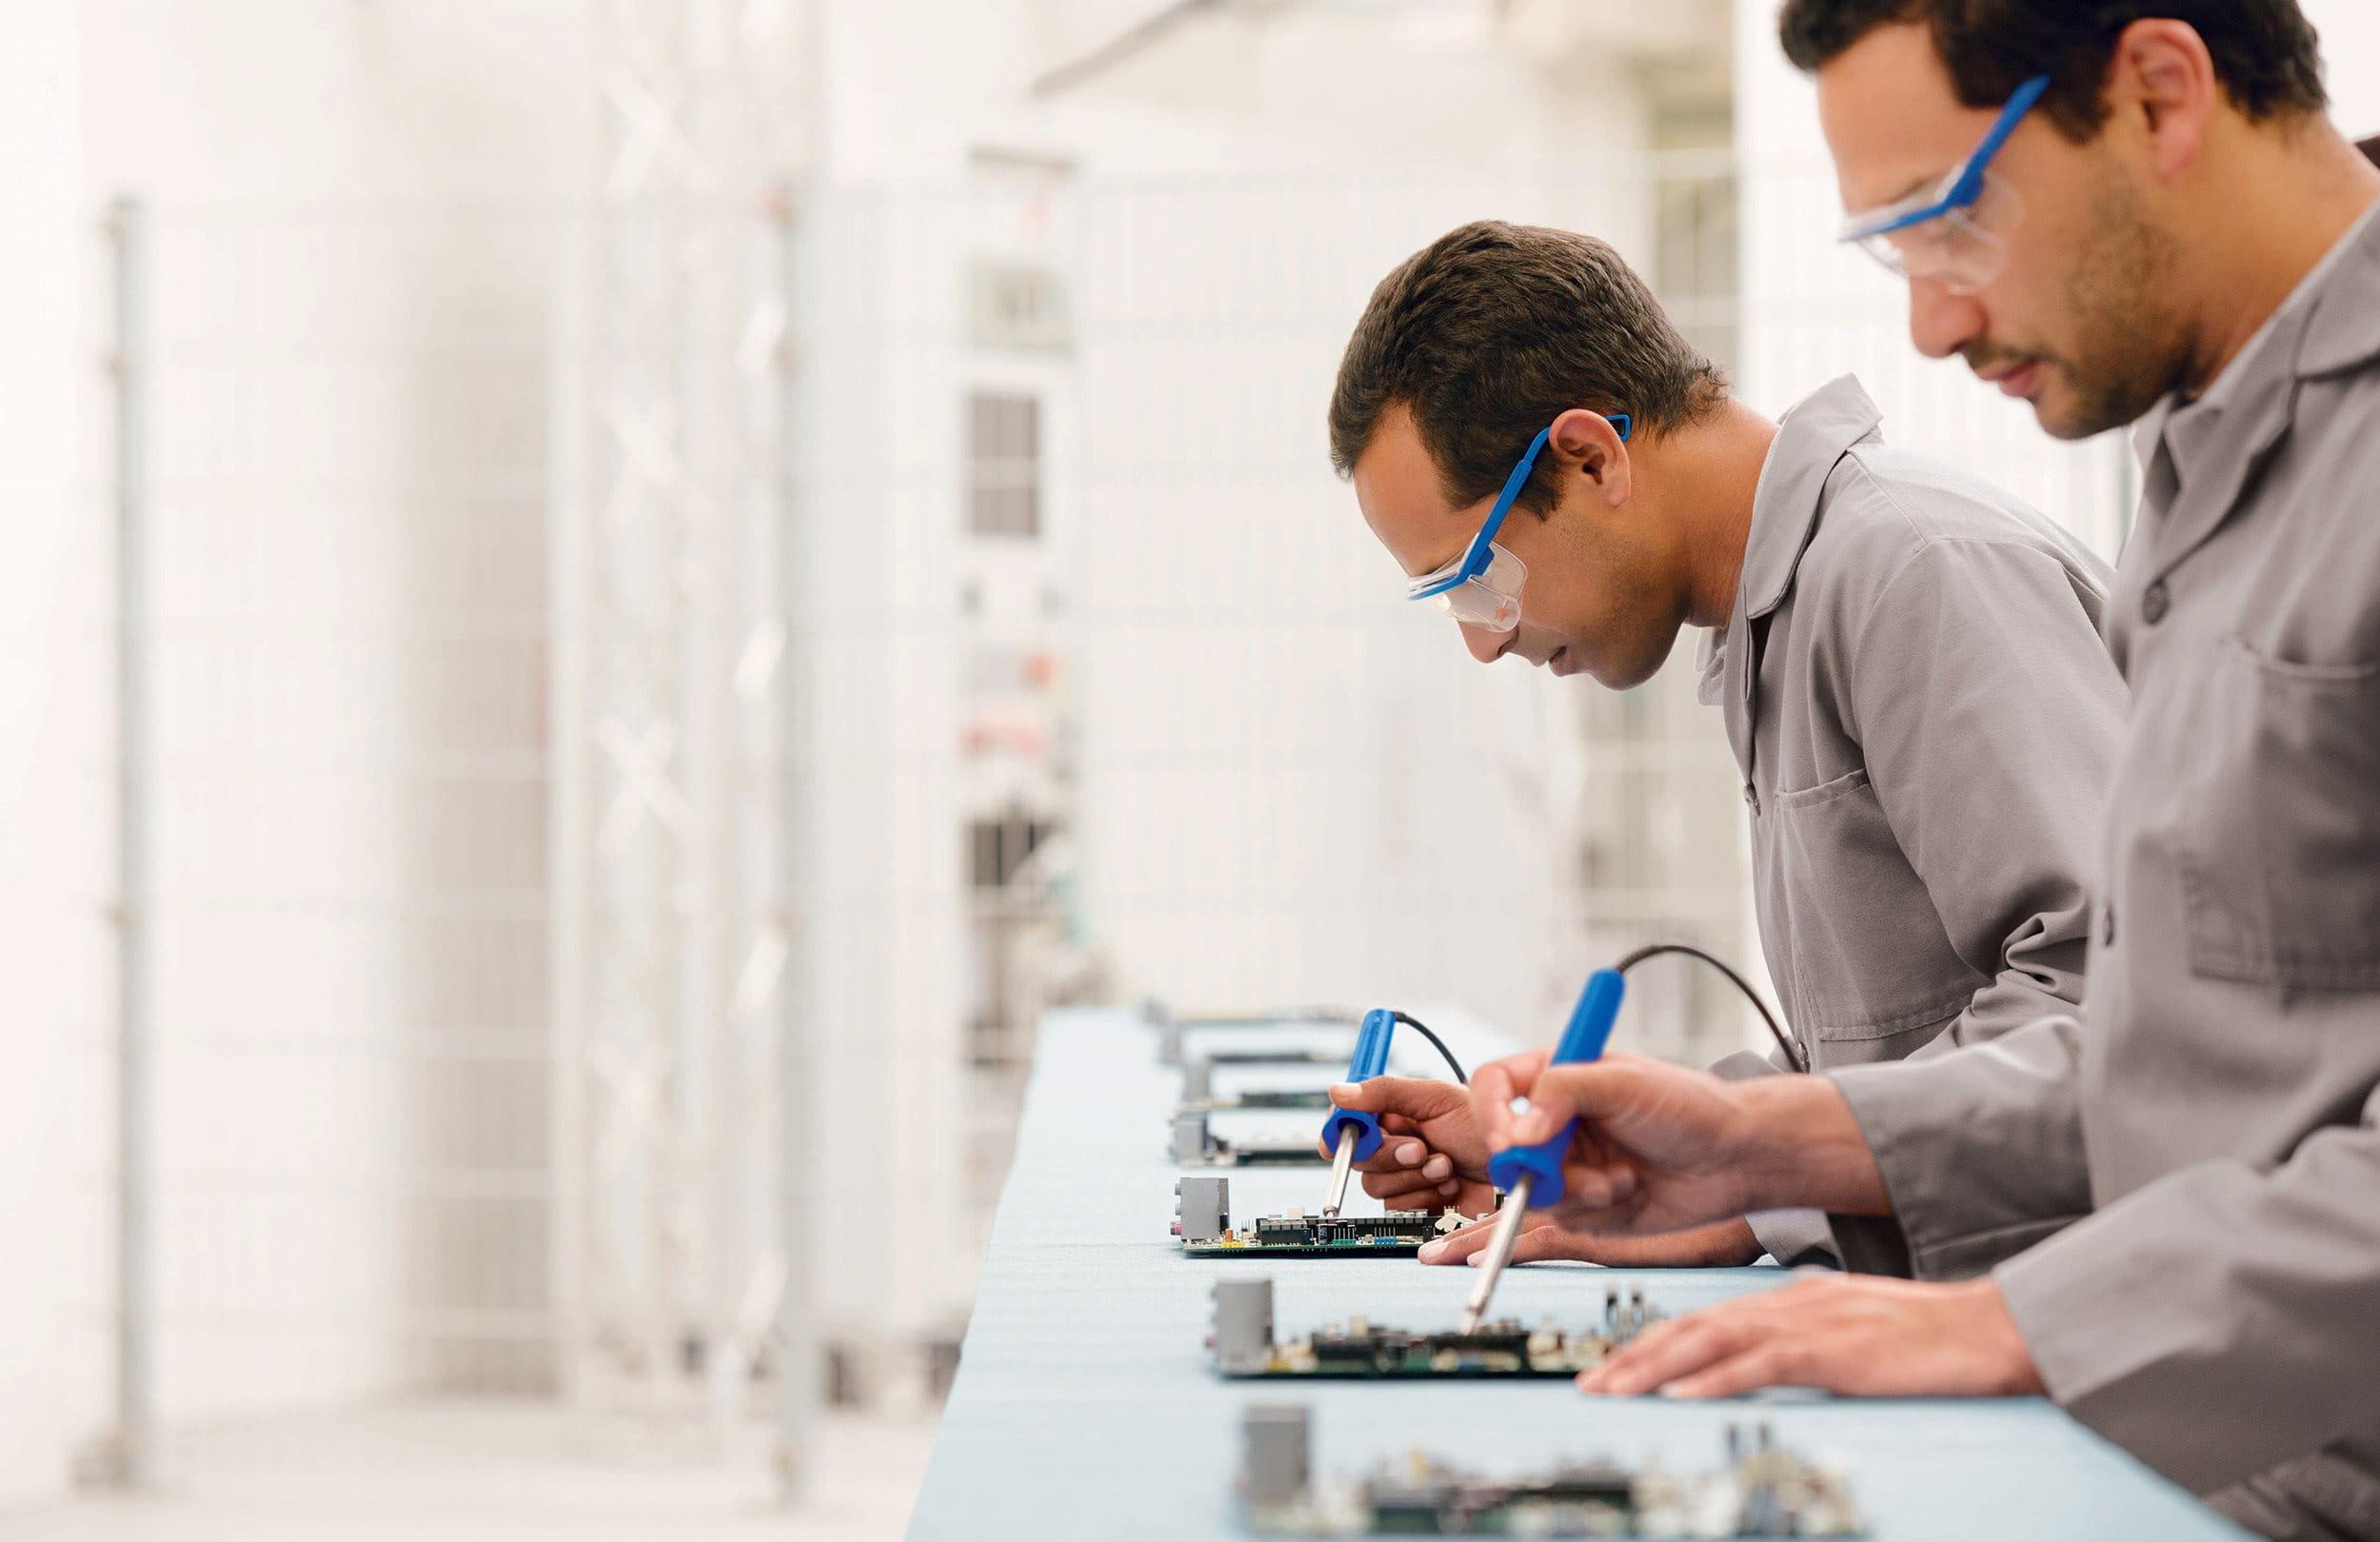 Men while soldering